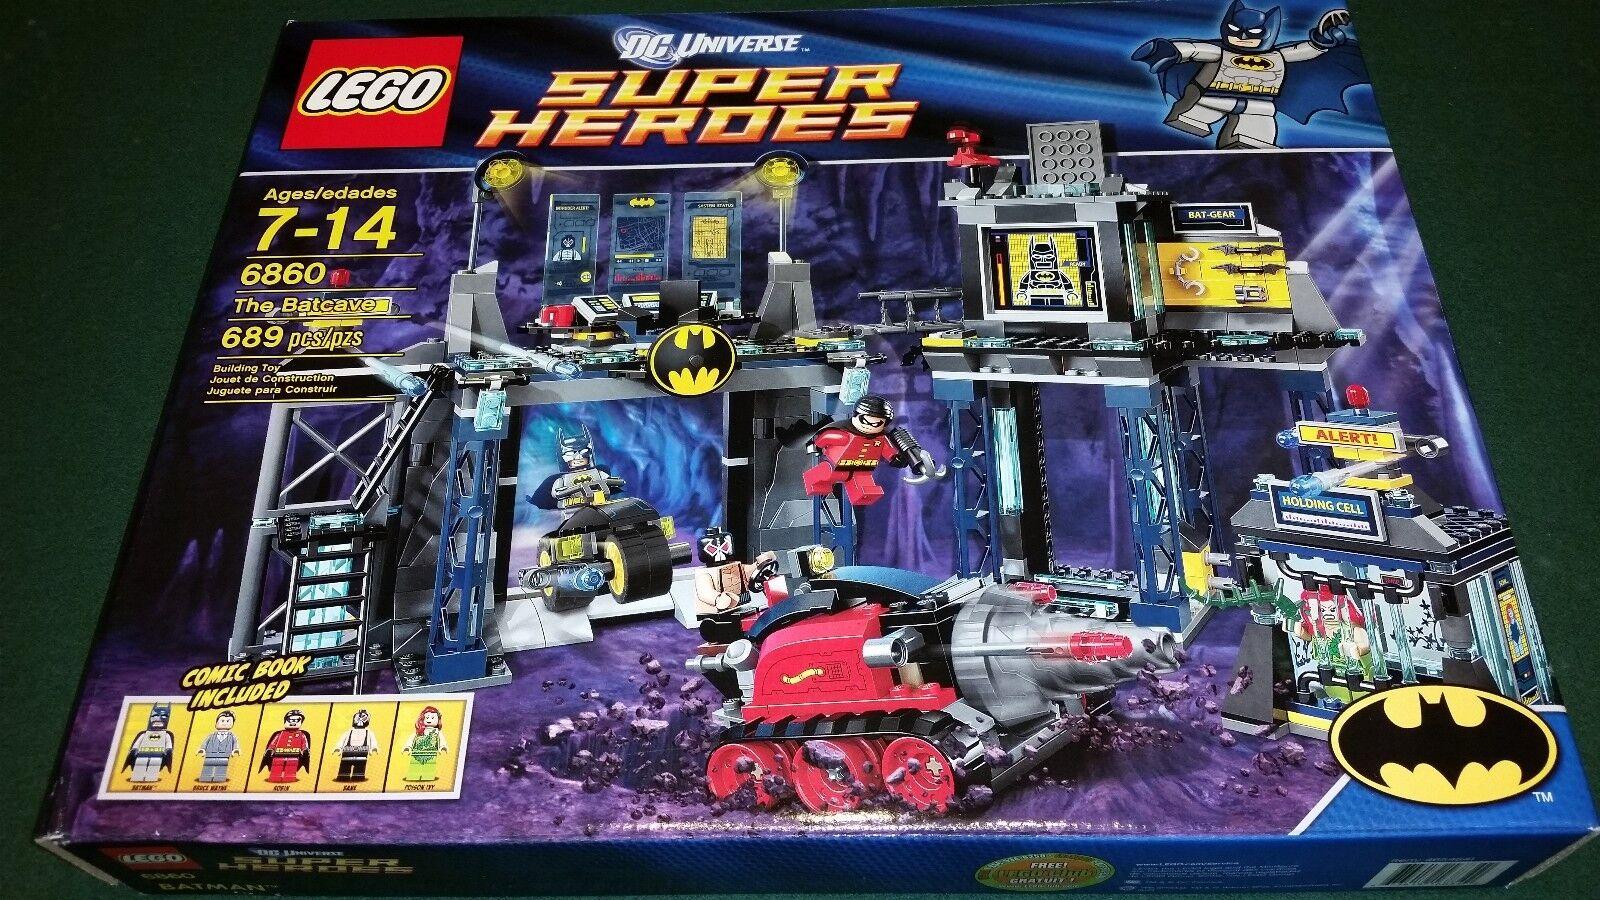 Lego Superheroes Batcave 6860 Batman Brand New Factory Sealed Retired